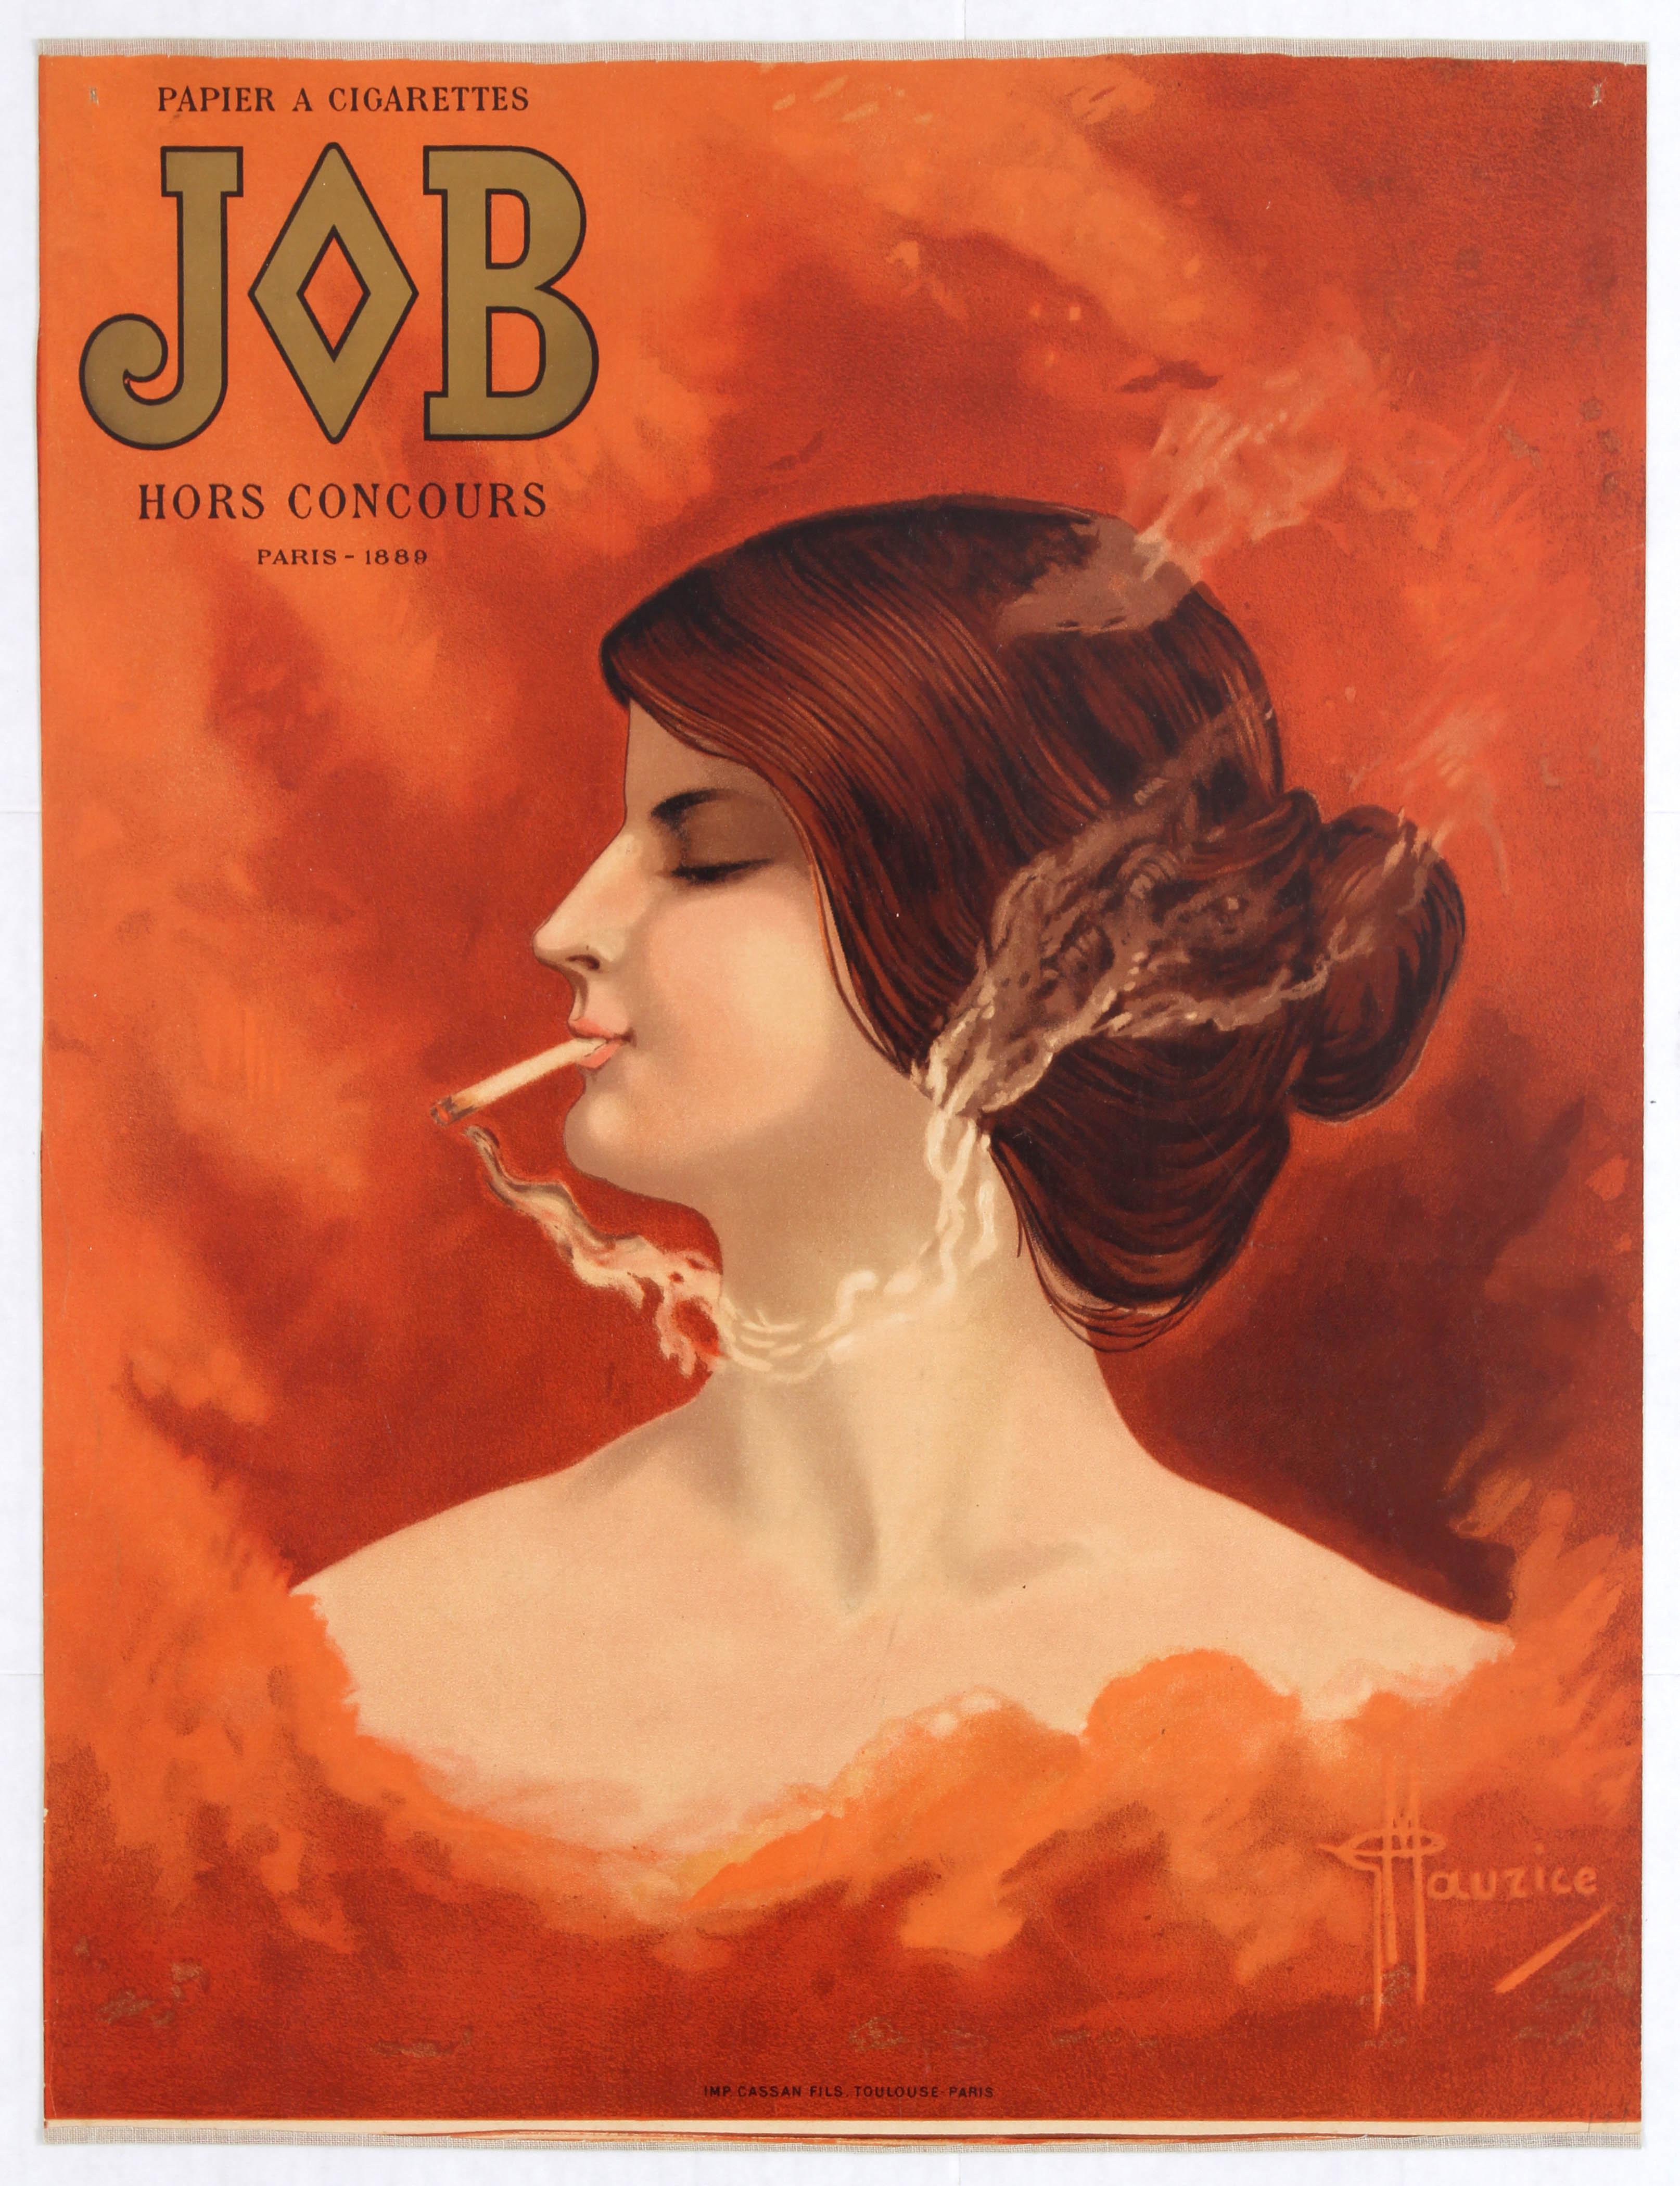 Lot 1007 - Advertising Poster Cigarette Paper Job